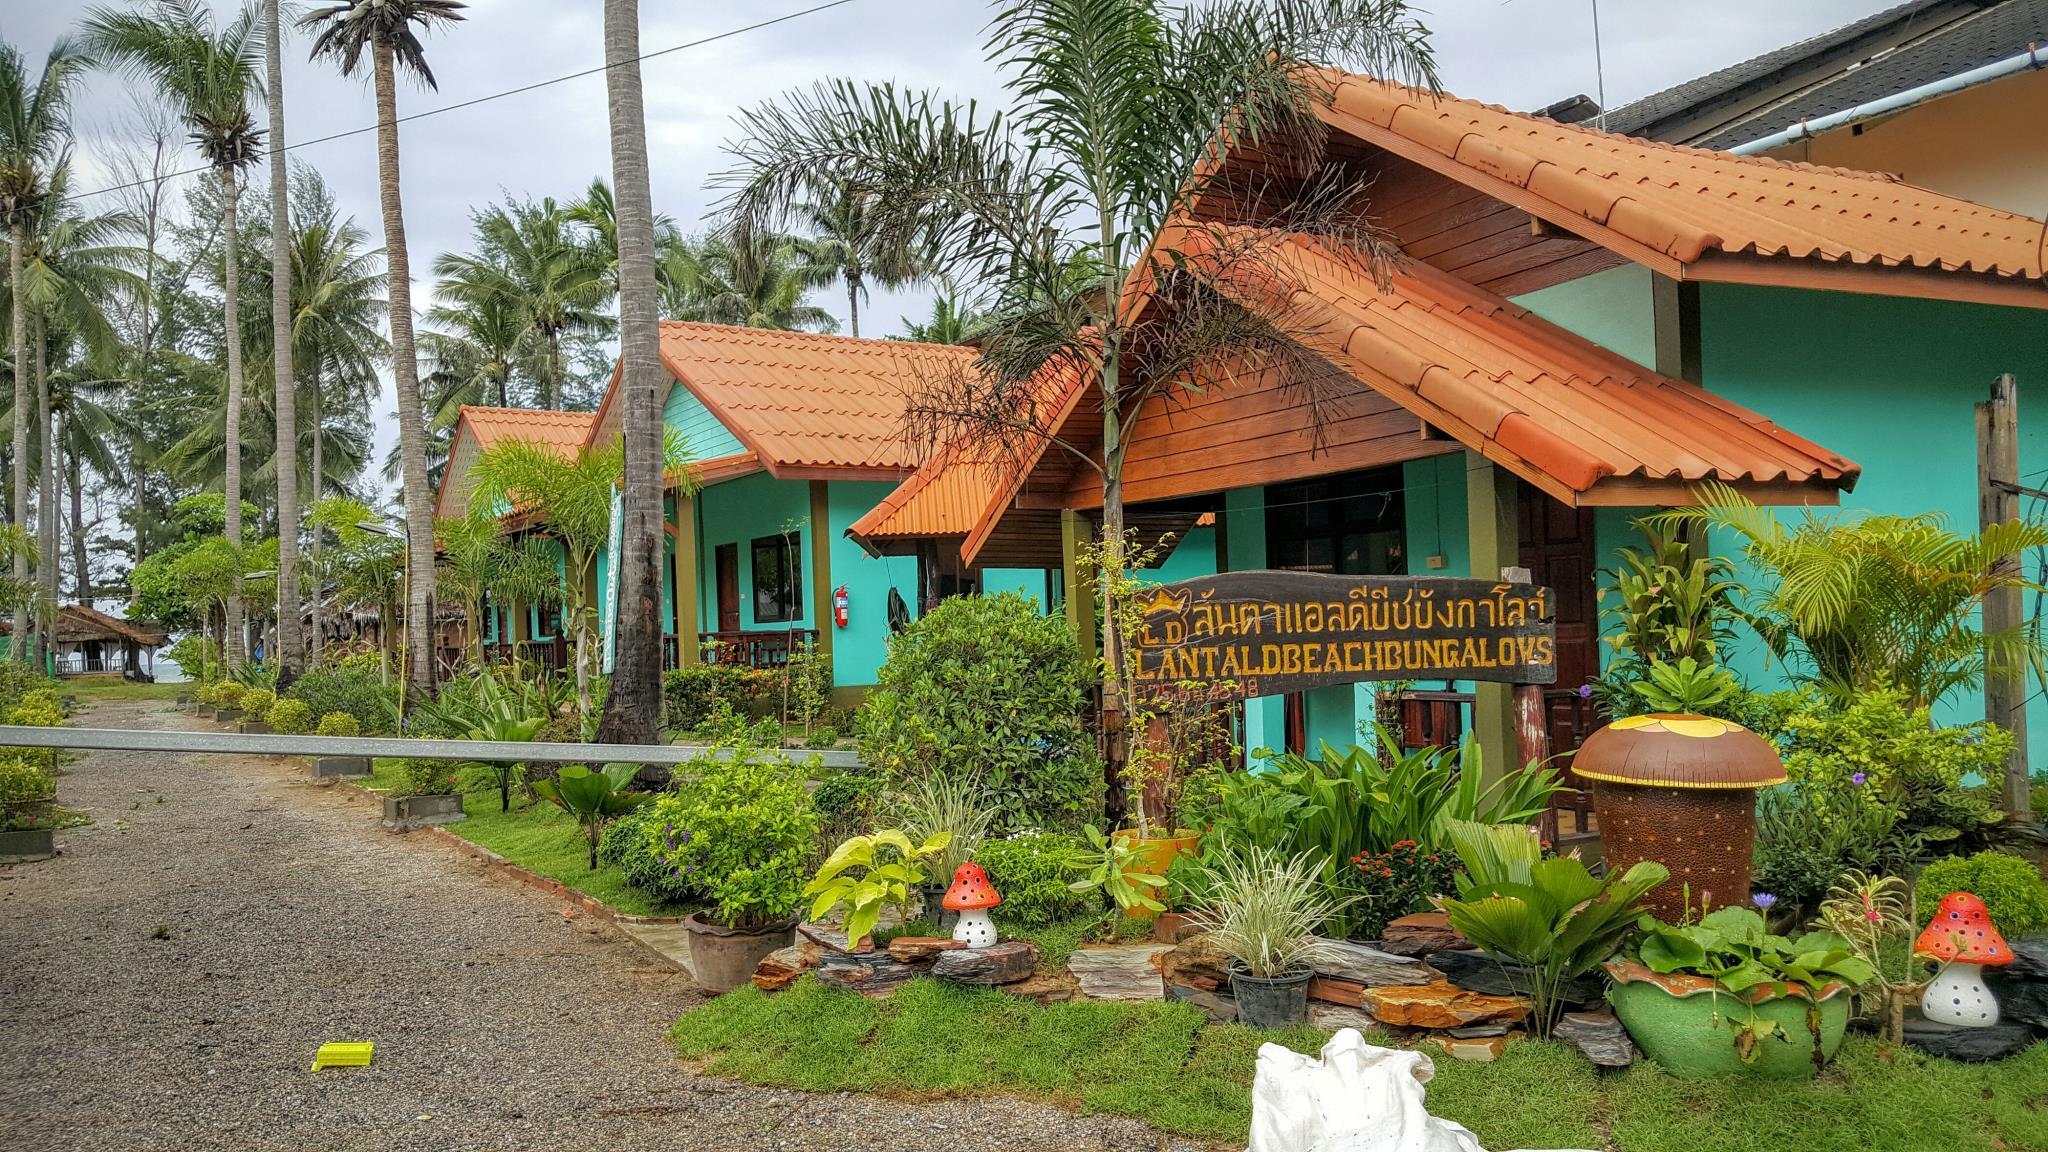 Lovely Koh Lanta Beach Bungalows Part - 1: More About Lanta L.D. Beach Bungalows